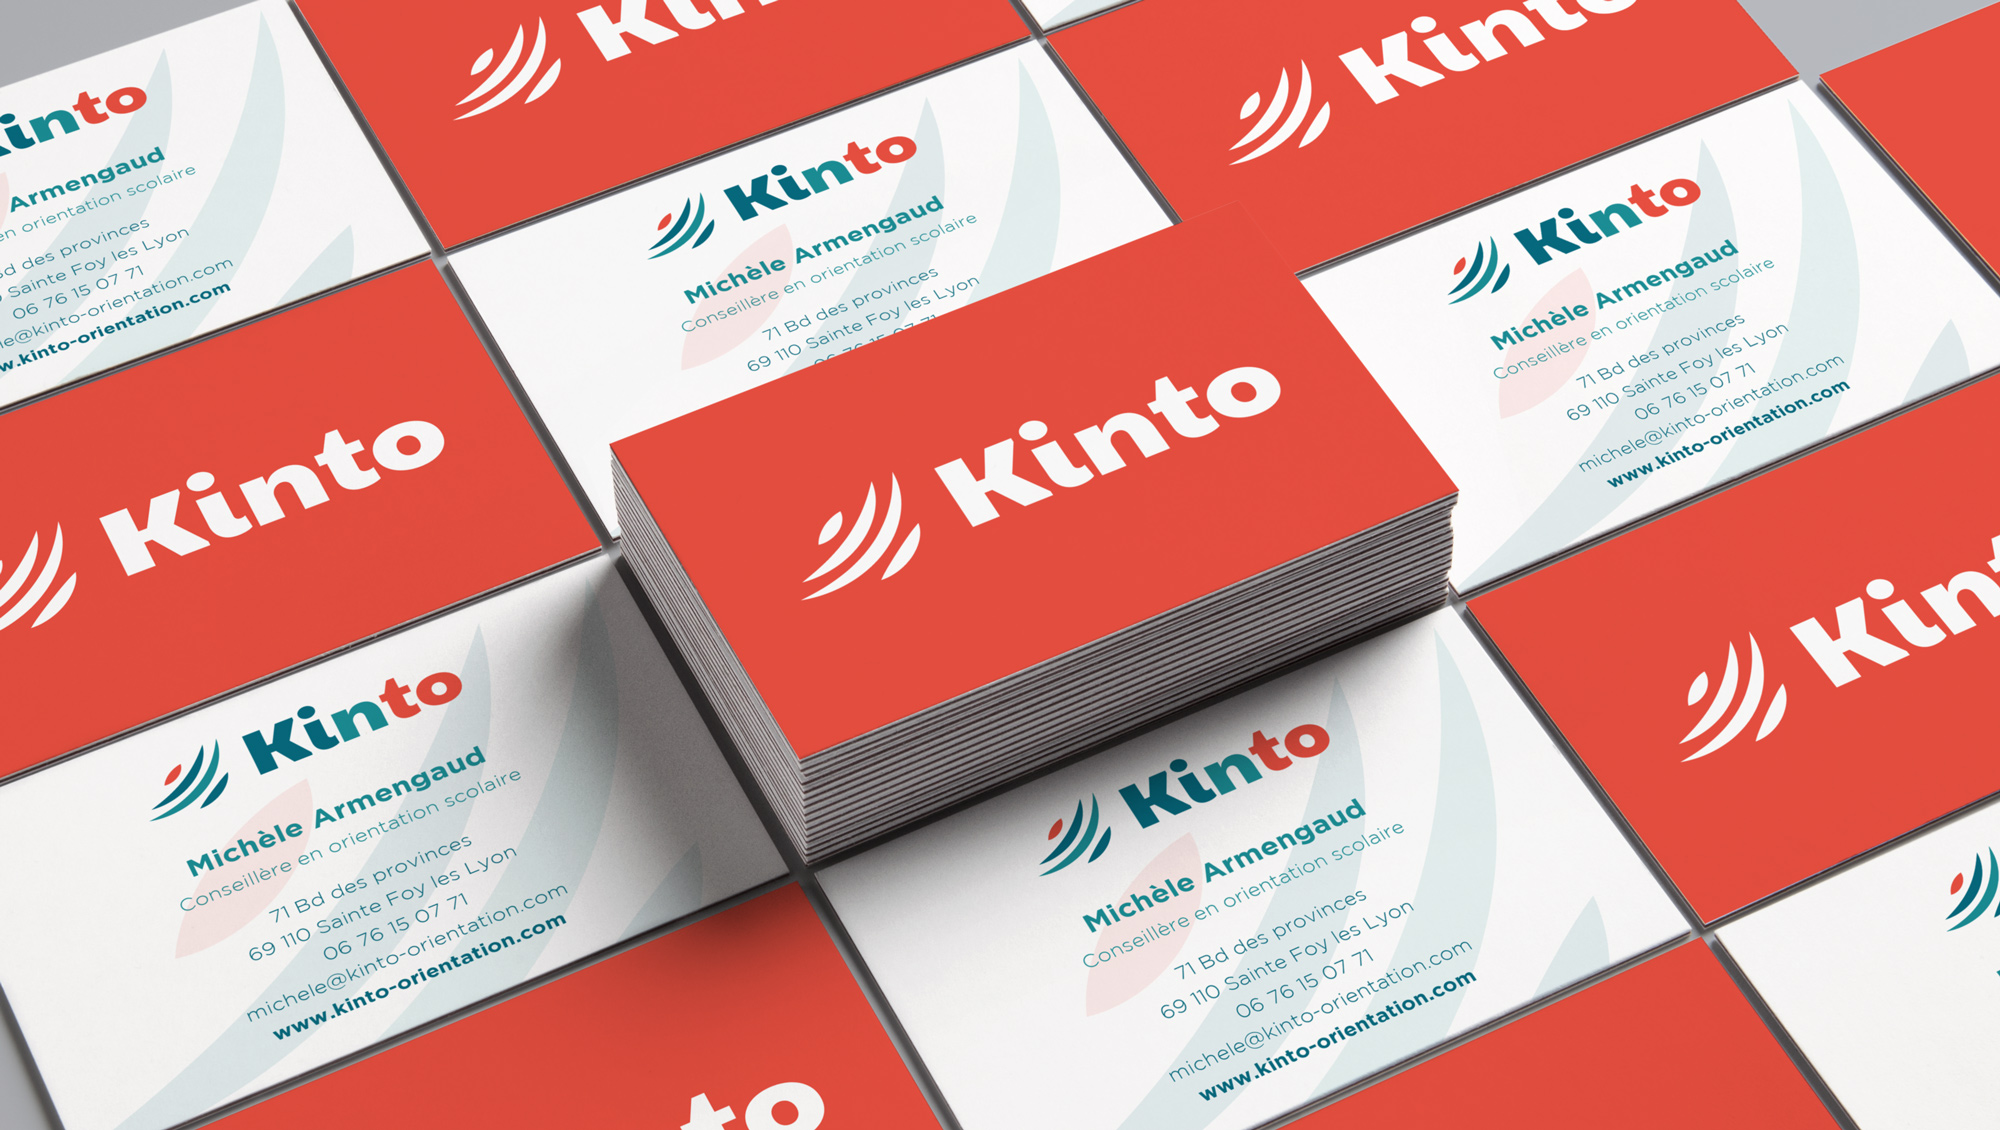 kinto-orientation-brand design